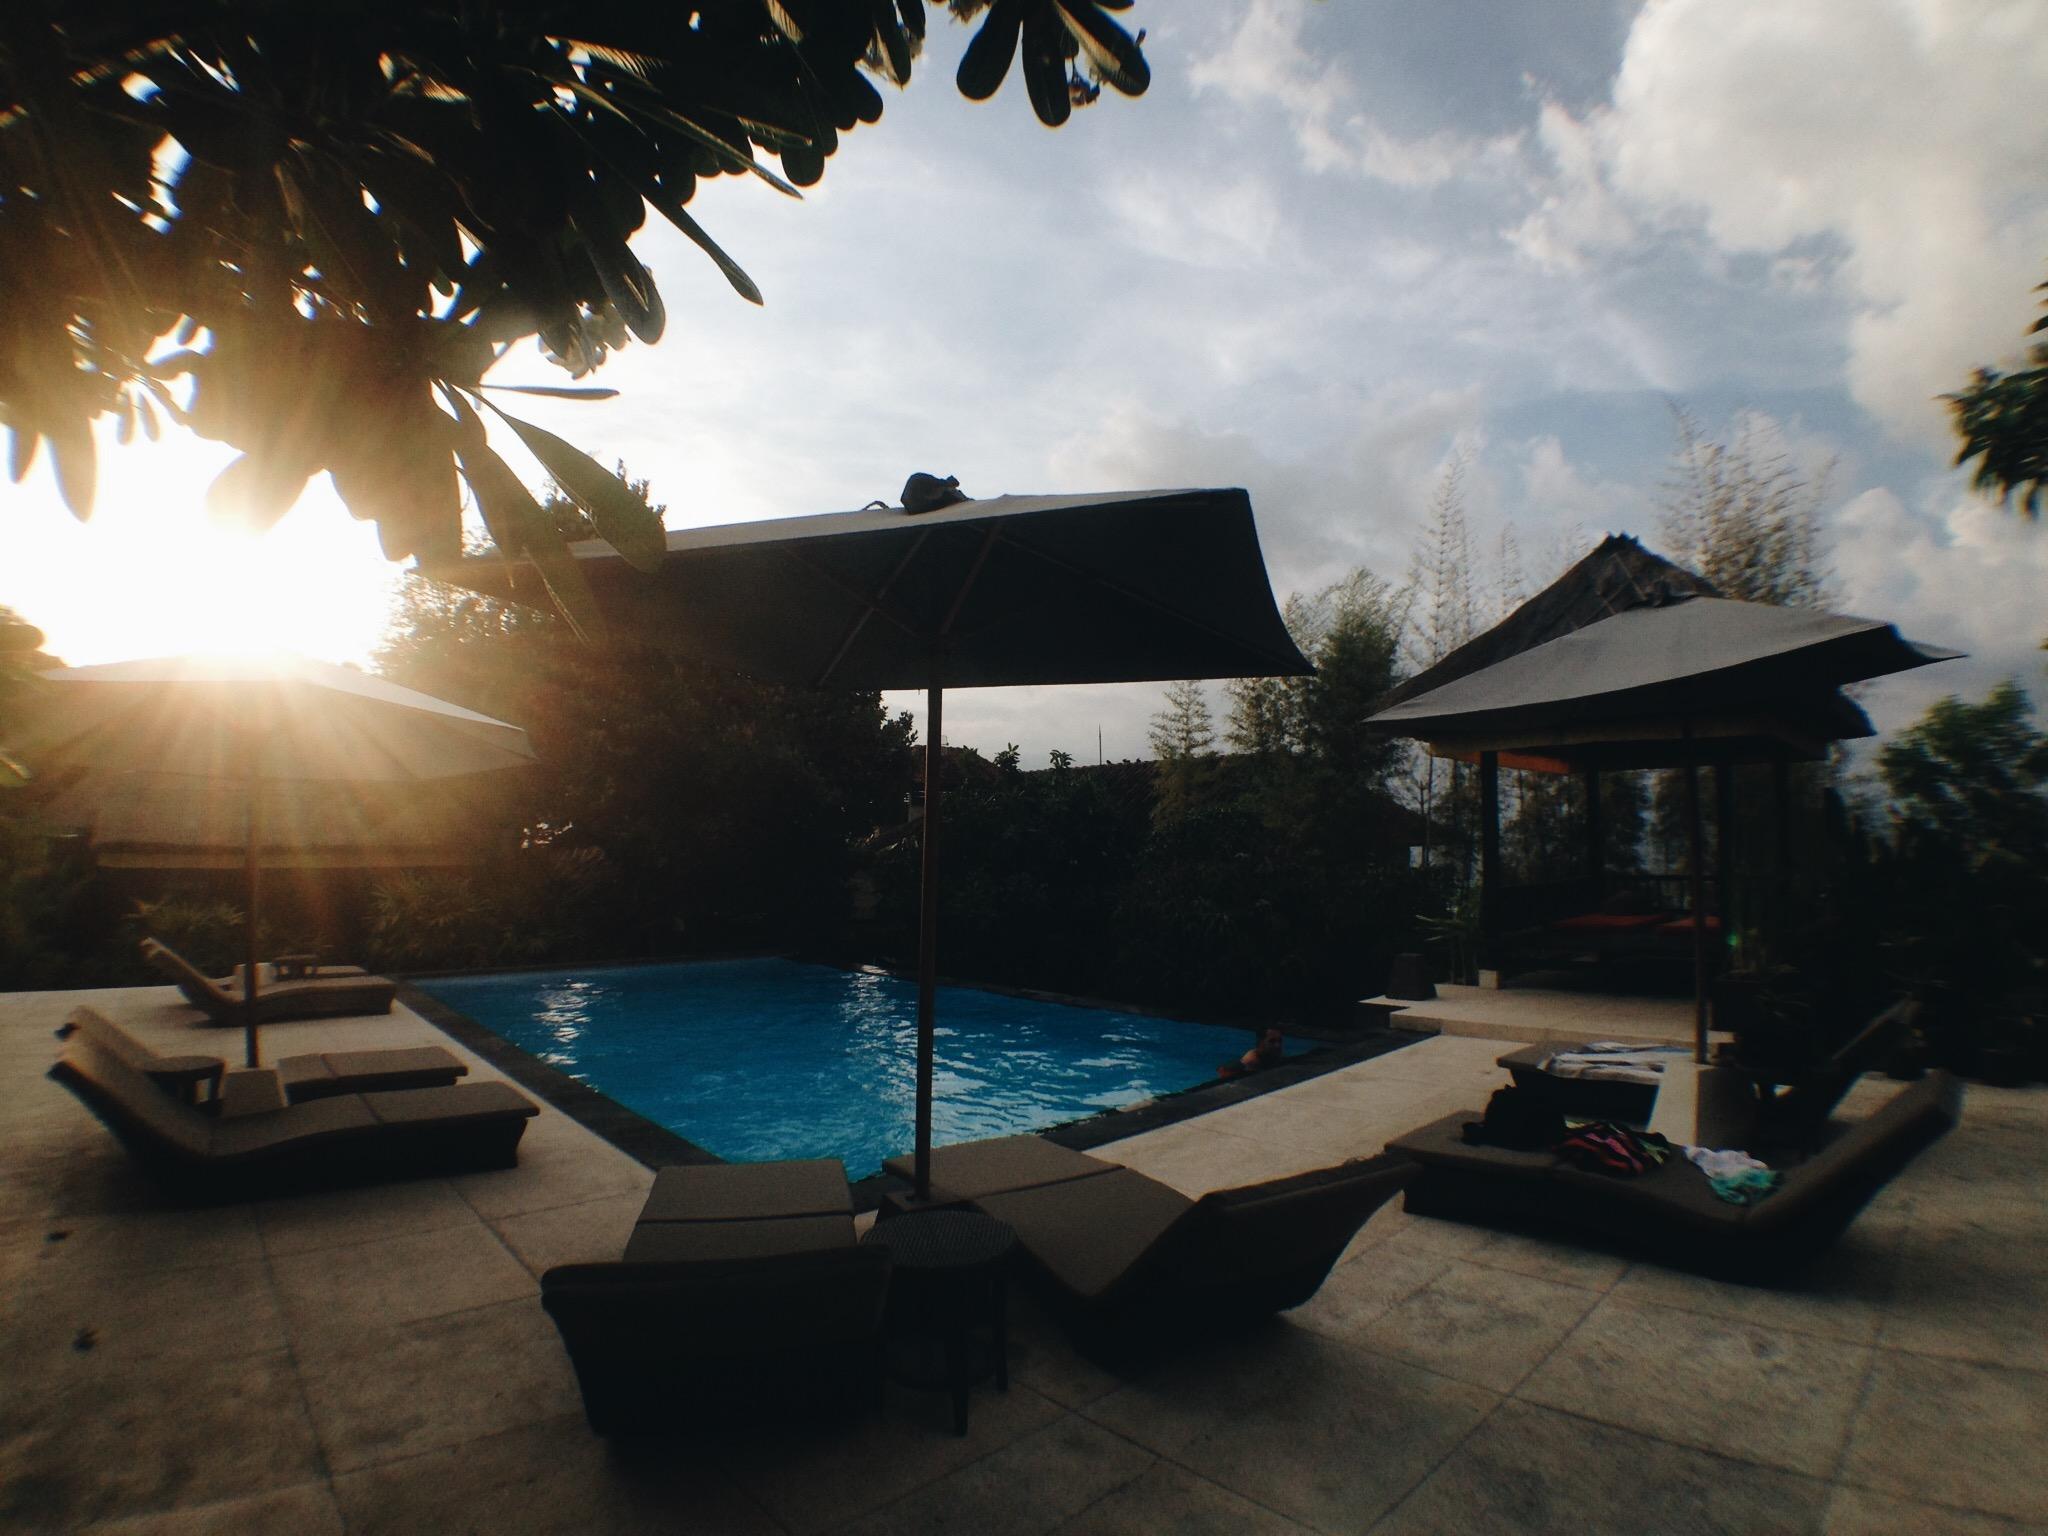 Pandana-guest-house-Bali-nusa-lembongan.JPG